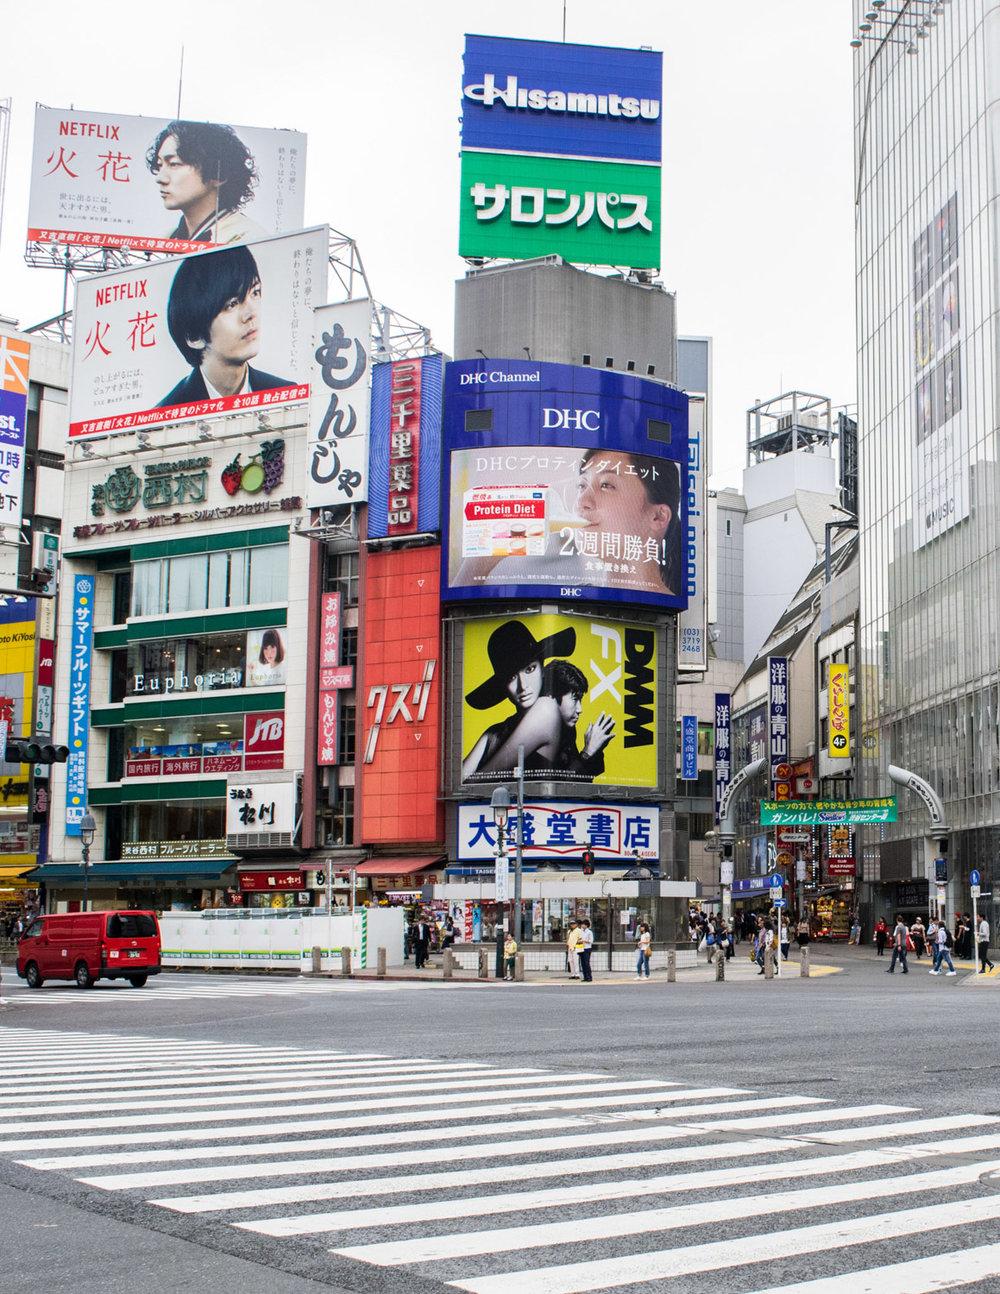 amaris-woo-tokyo-shibuya-crossing-japan